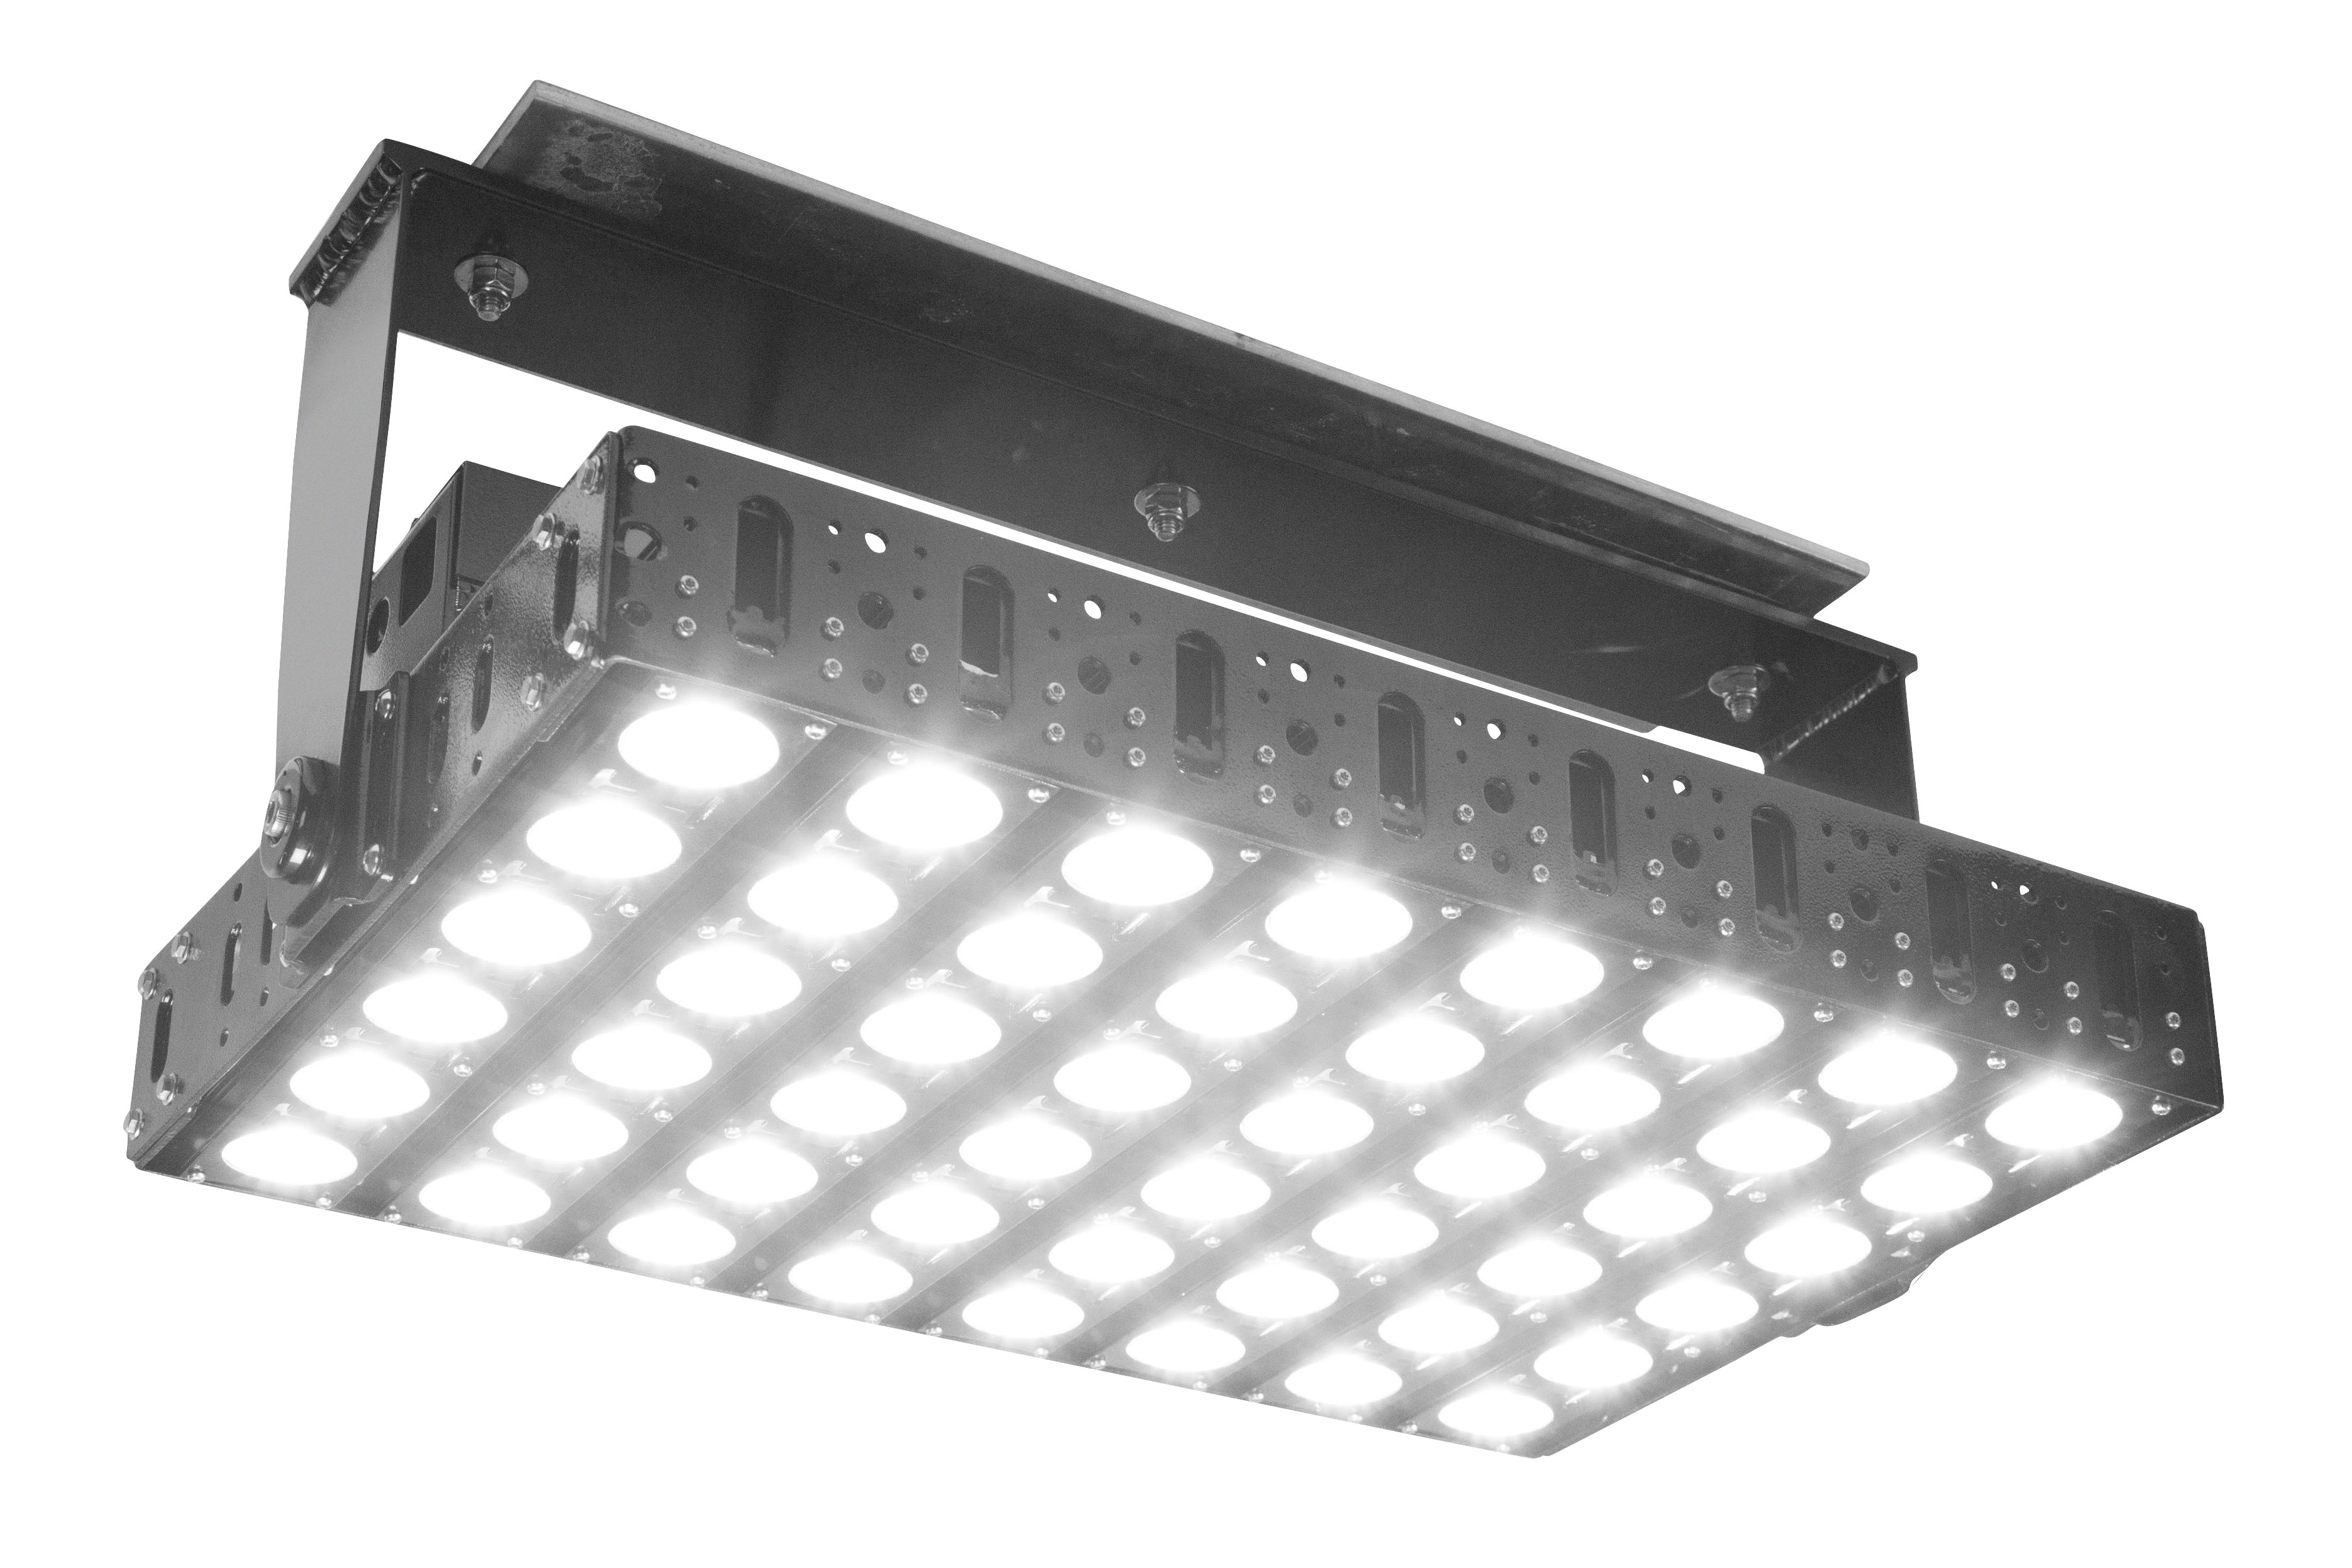 Larson Electronics Releases A 500 Watt Led Crane Light